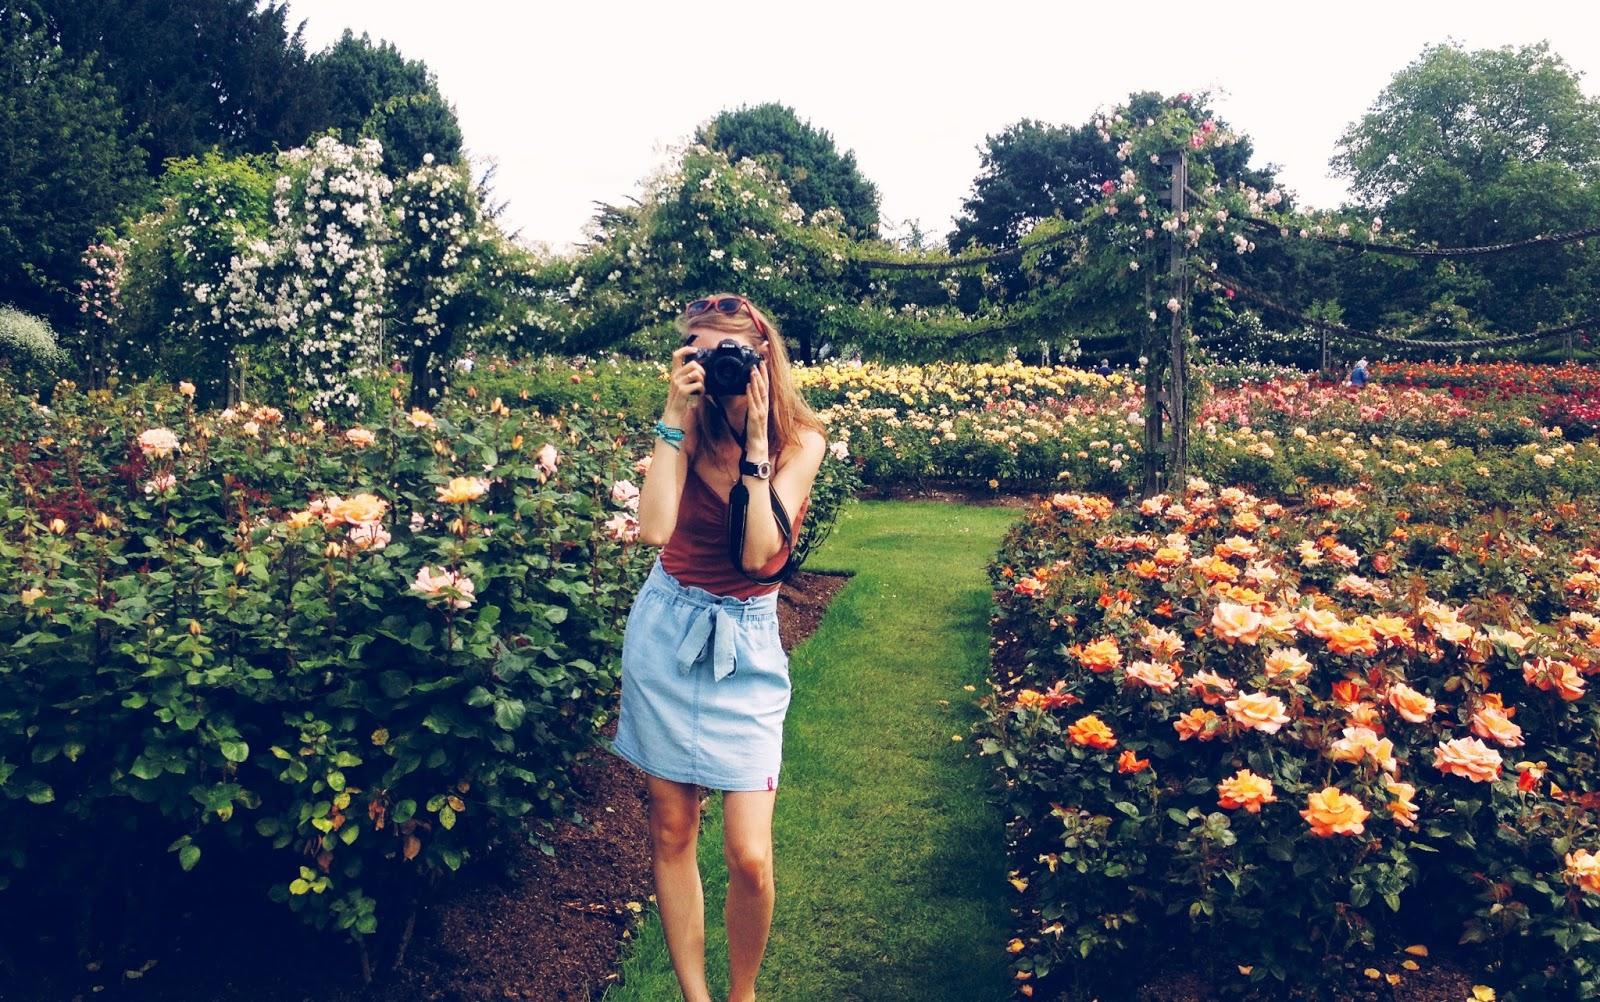 Roses In Garden: The Rose Garden { Queen Mary's Rose Garden